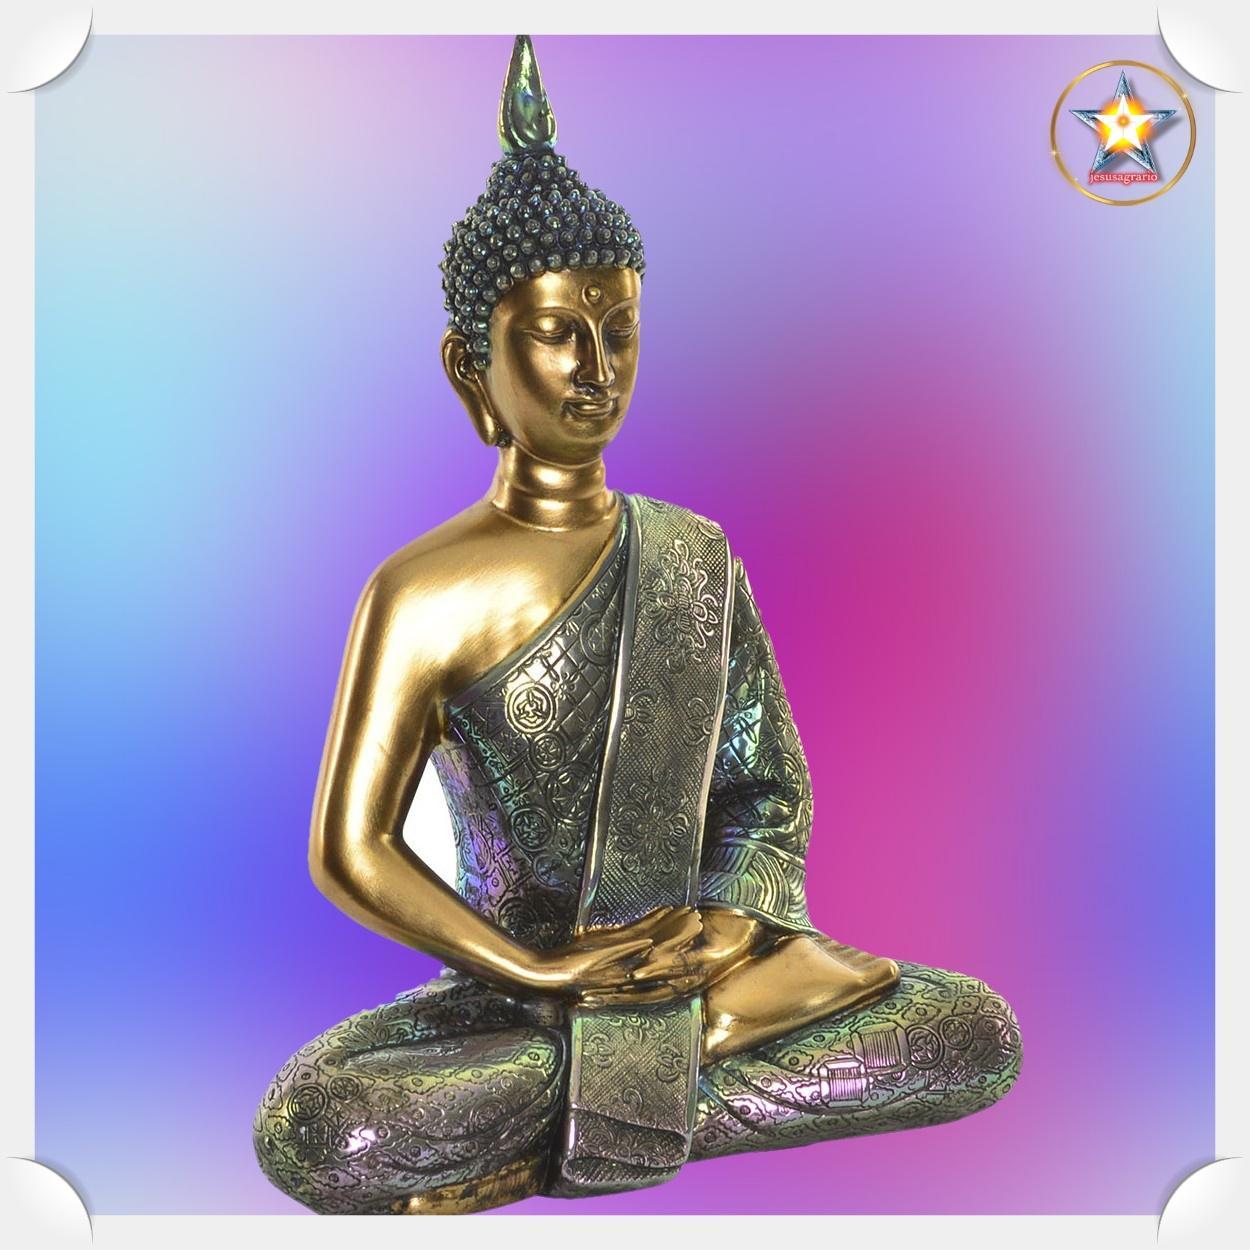 Posicion para meditar